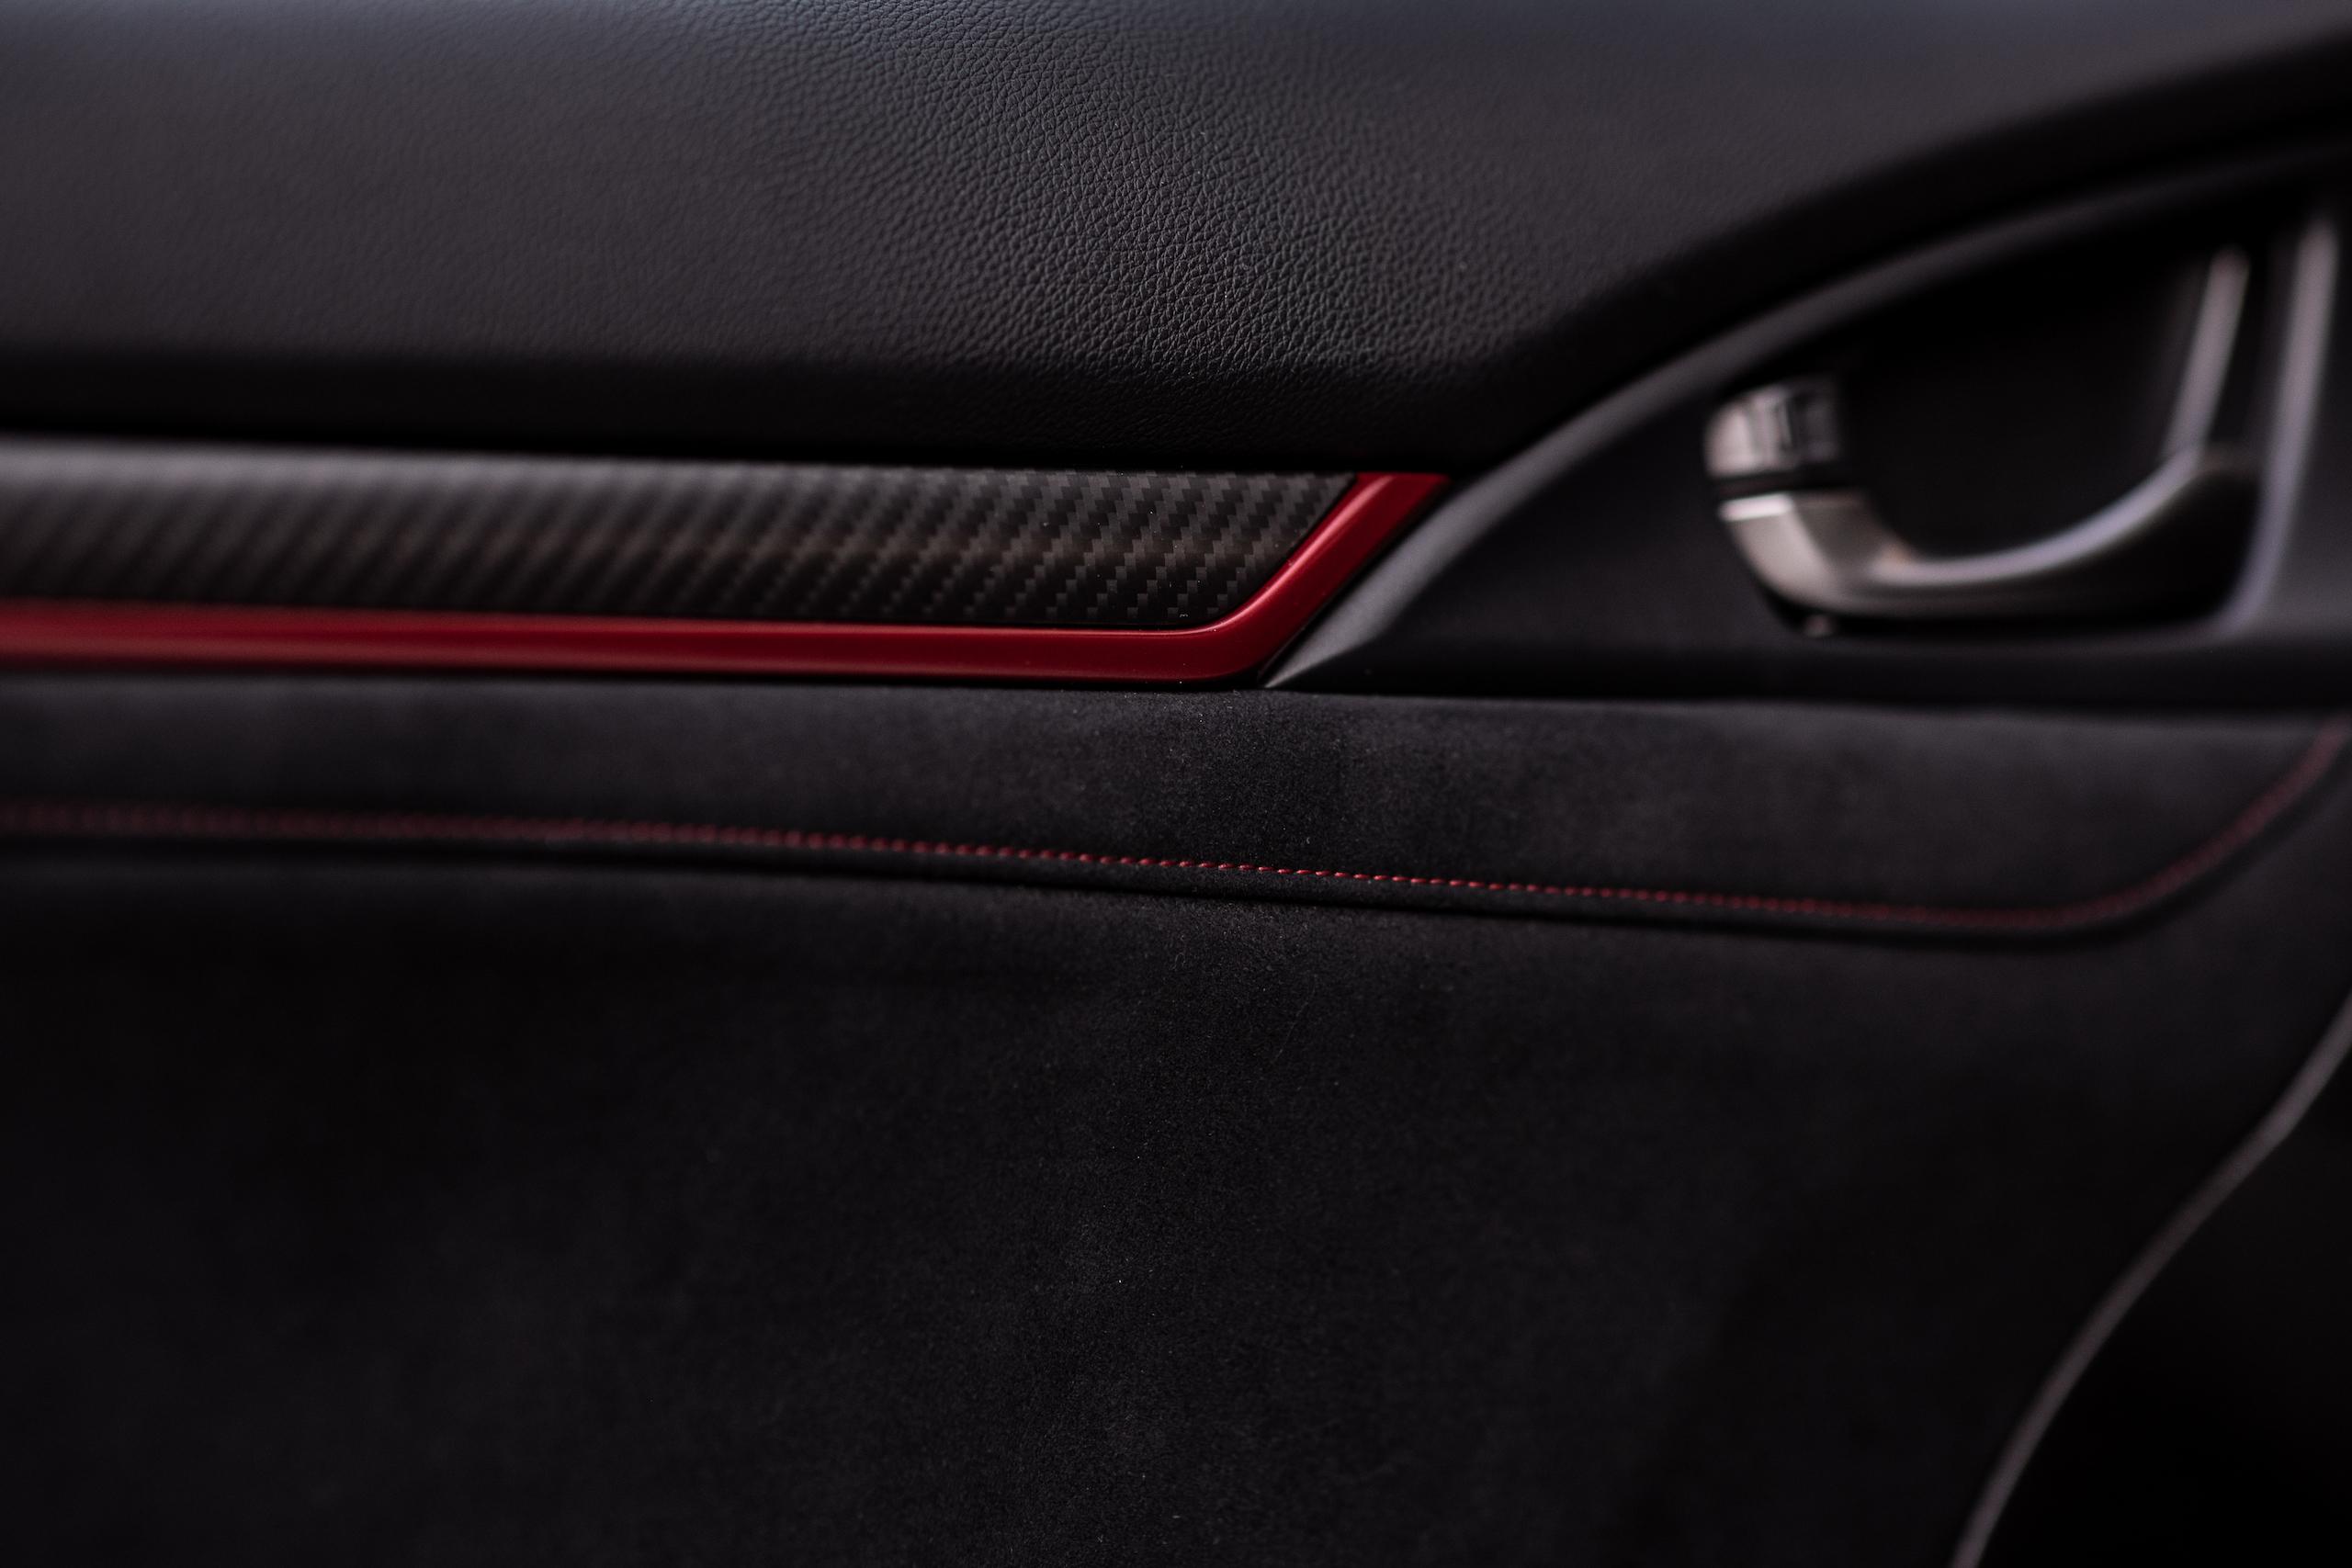 2020 Honda Civic Type R interior door panel detail